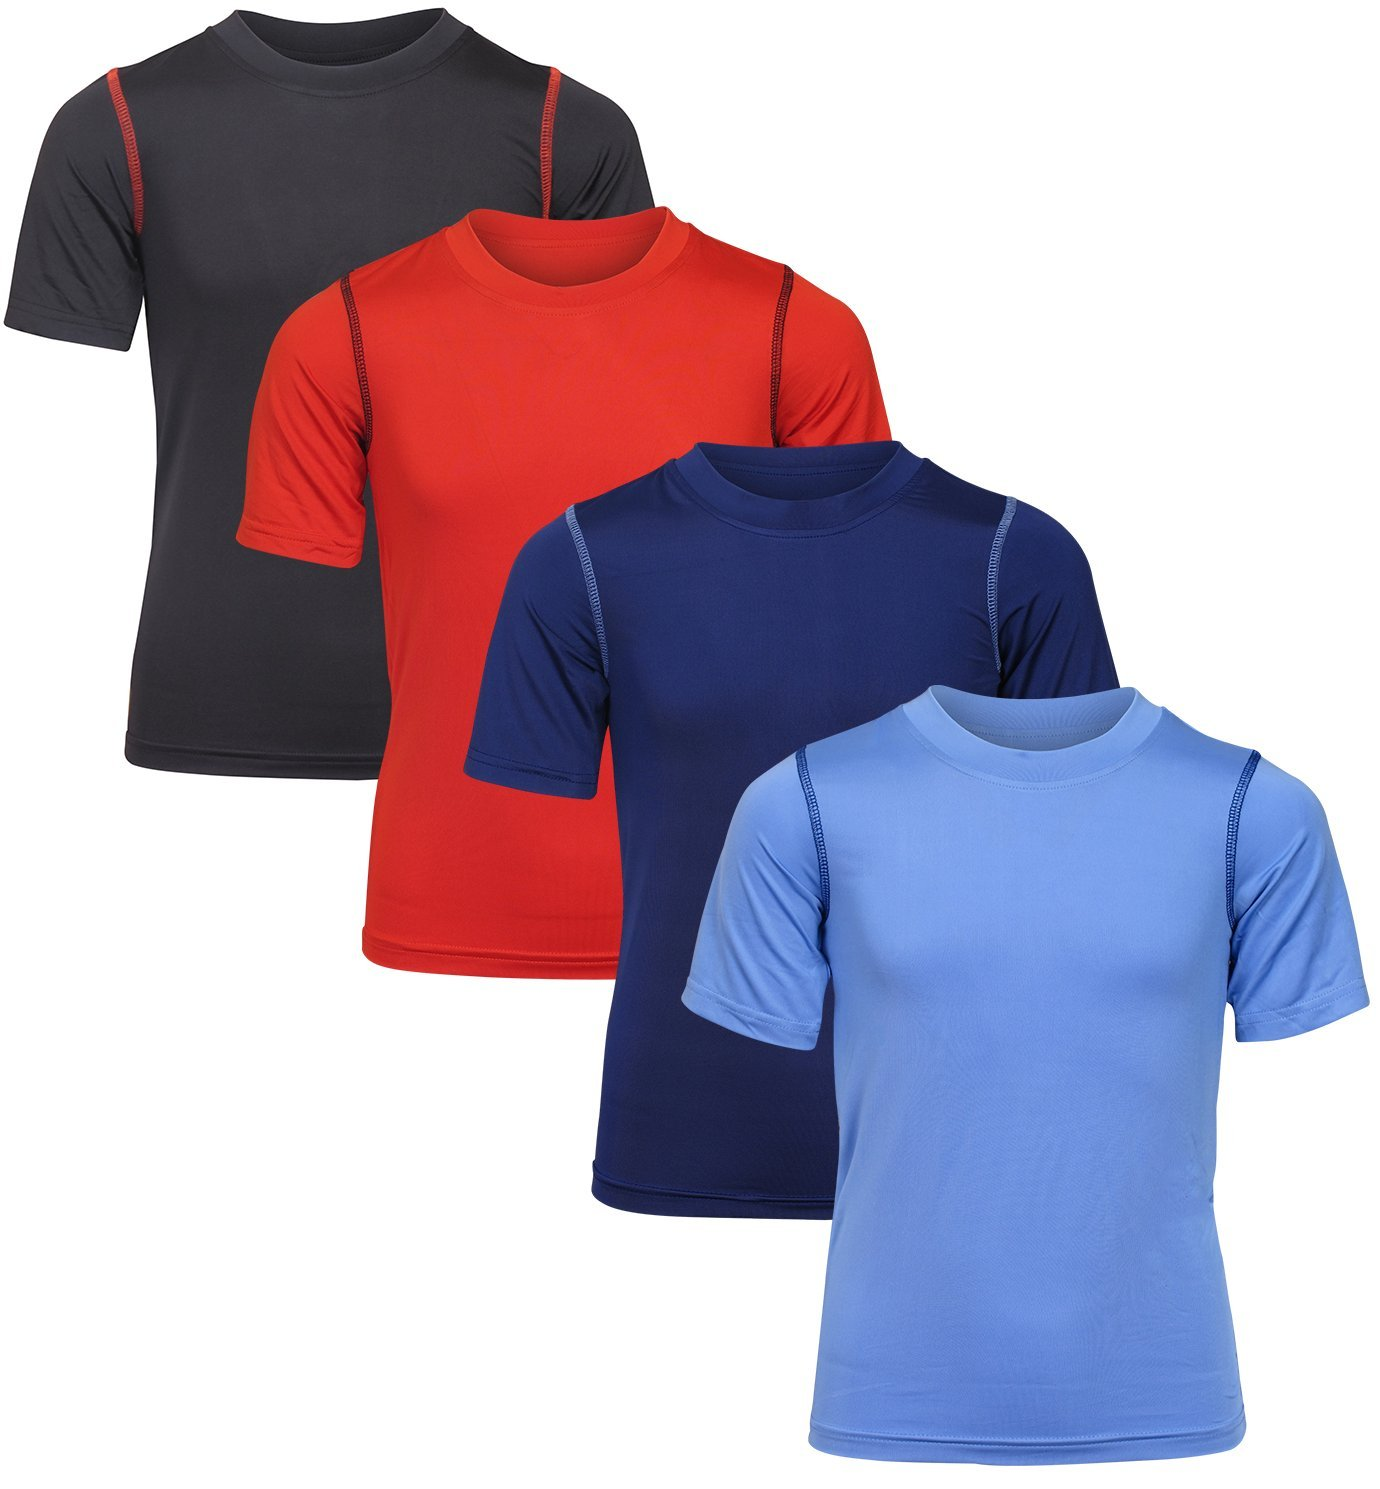 Black Bear Boy's Performance Dry-Fit T-Shirts (4 Pack) Light Blue/Navy/Black/Red, Large/12-14'